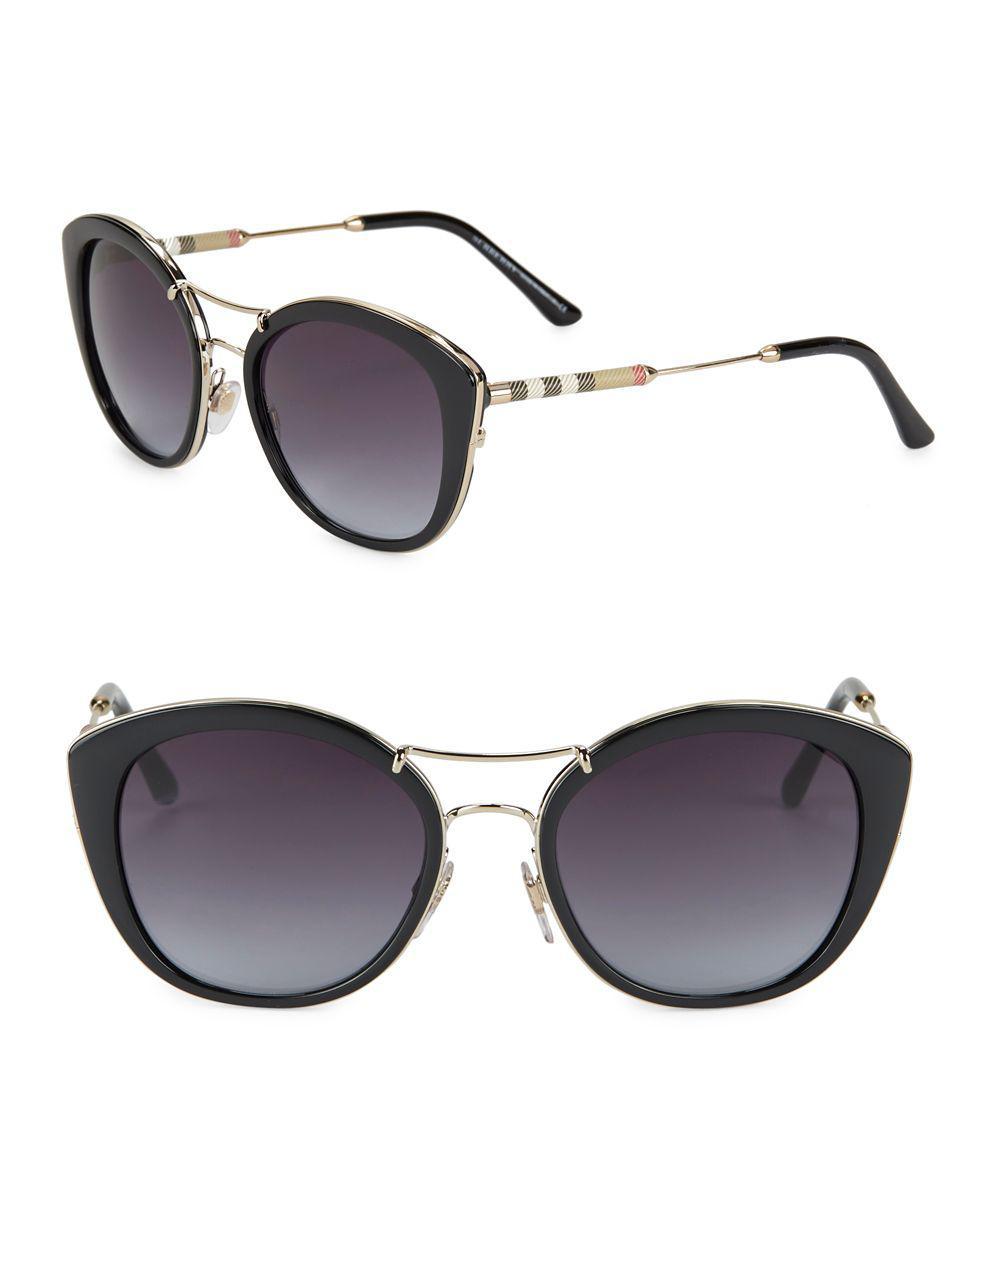 525fba21a3 Lyst - Burberry 53mm Cat Eye Sunglasses in Black